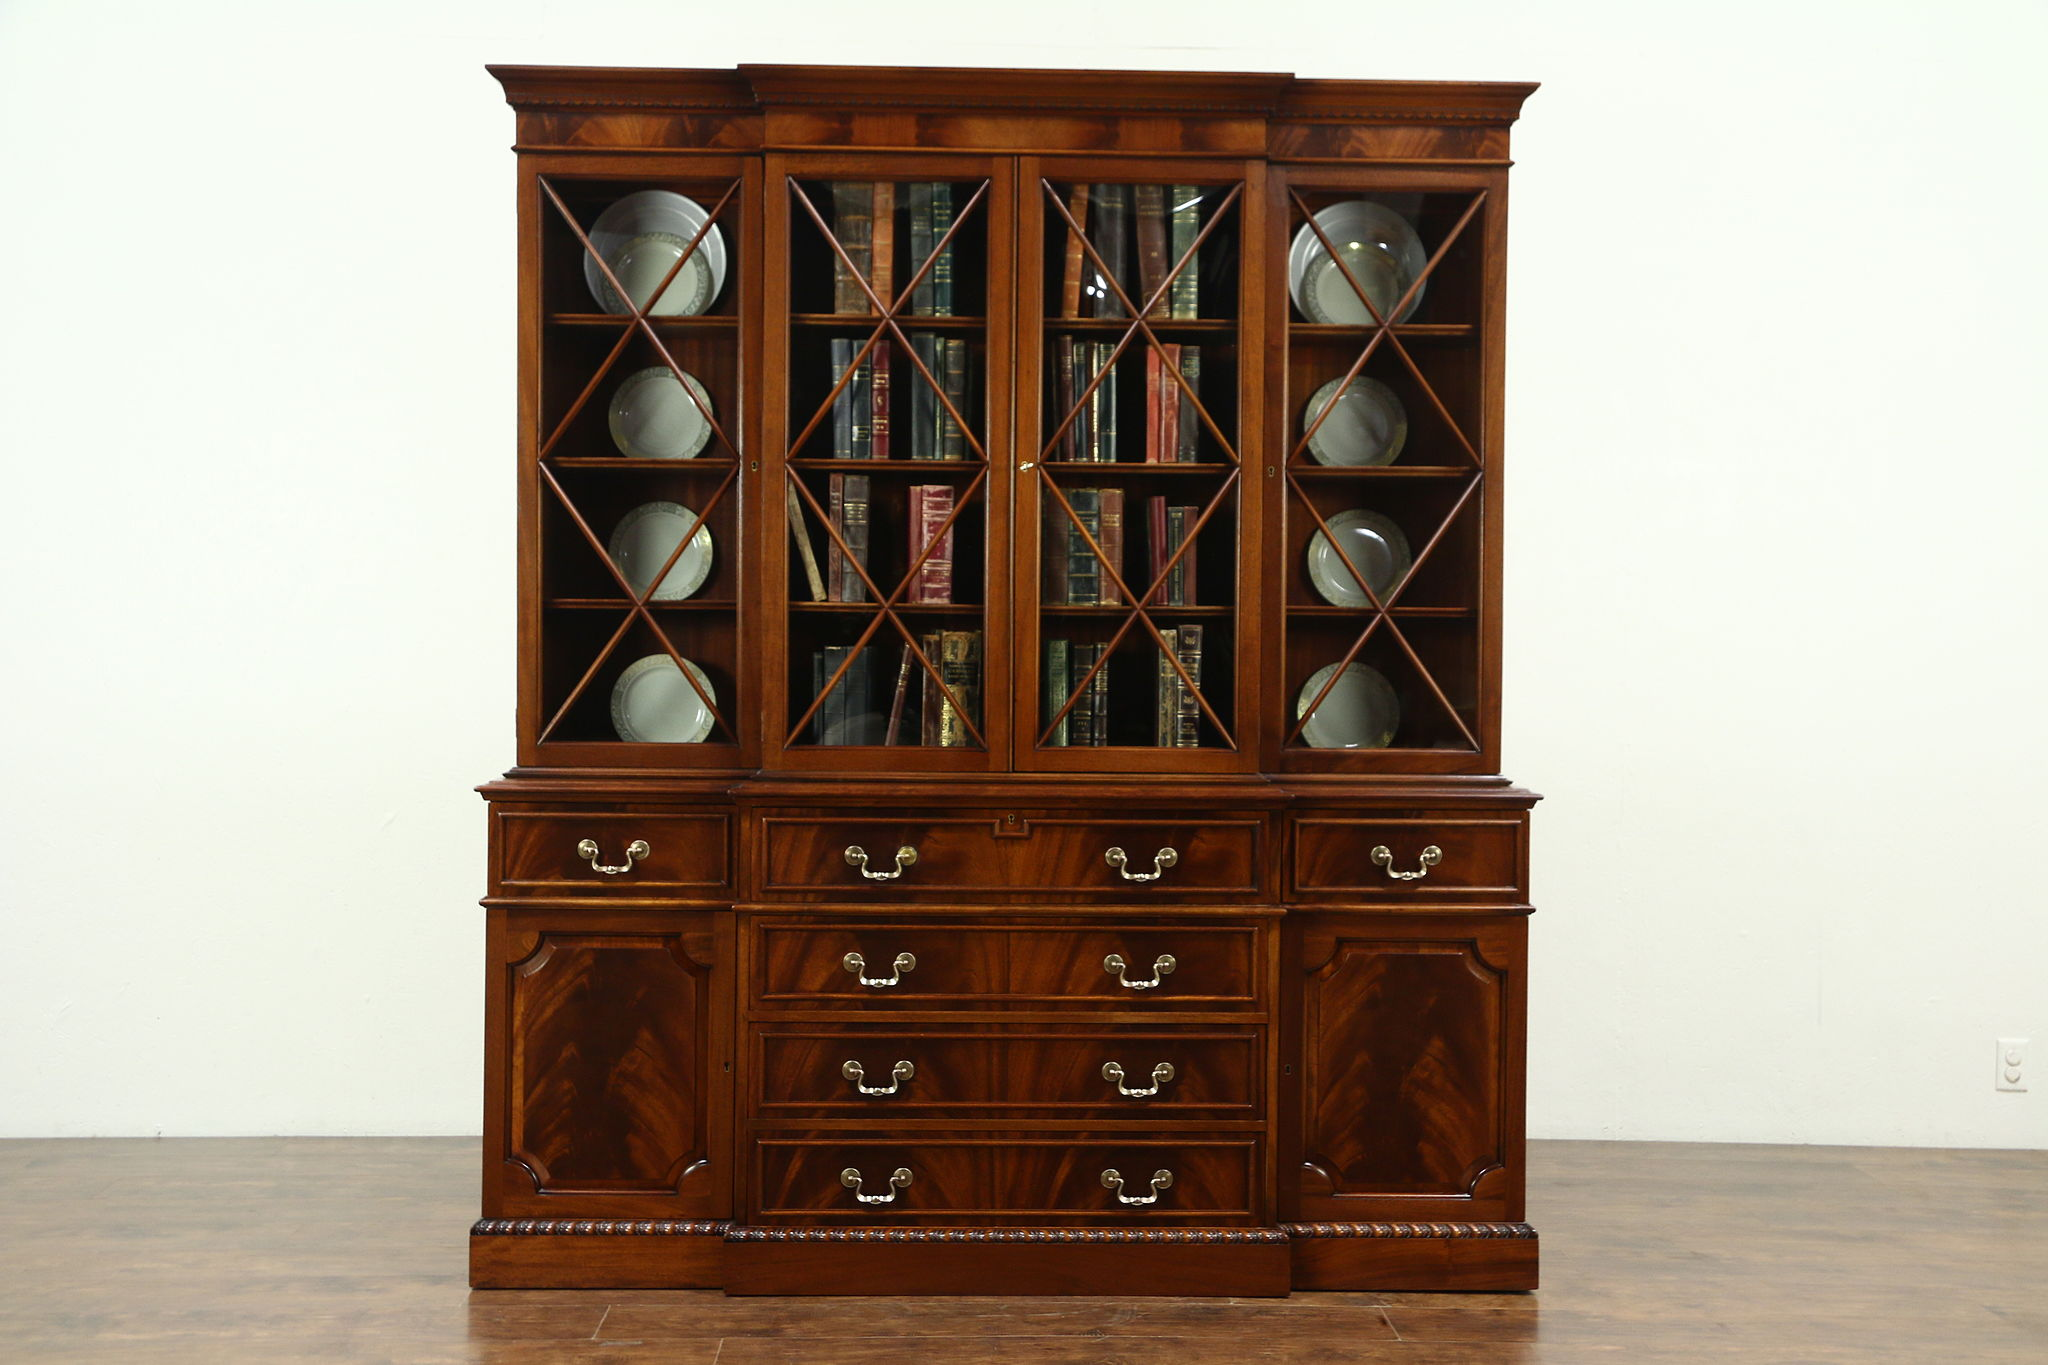 Mahogany Vintage Breakfront China Cabinet Bookcase Desk Signed Saginaw